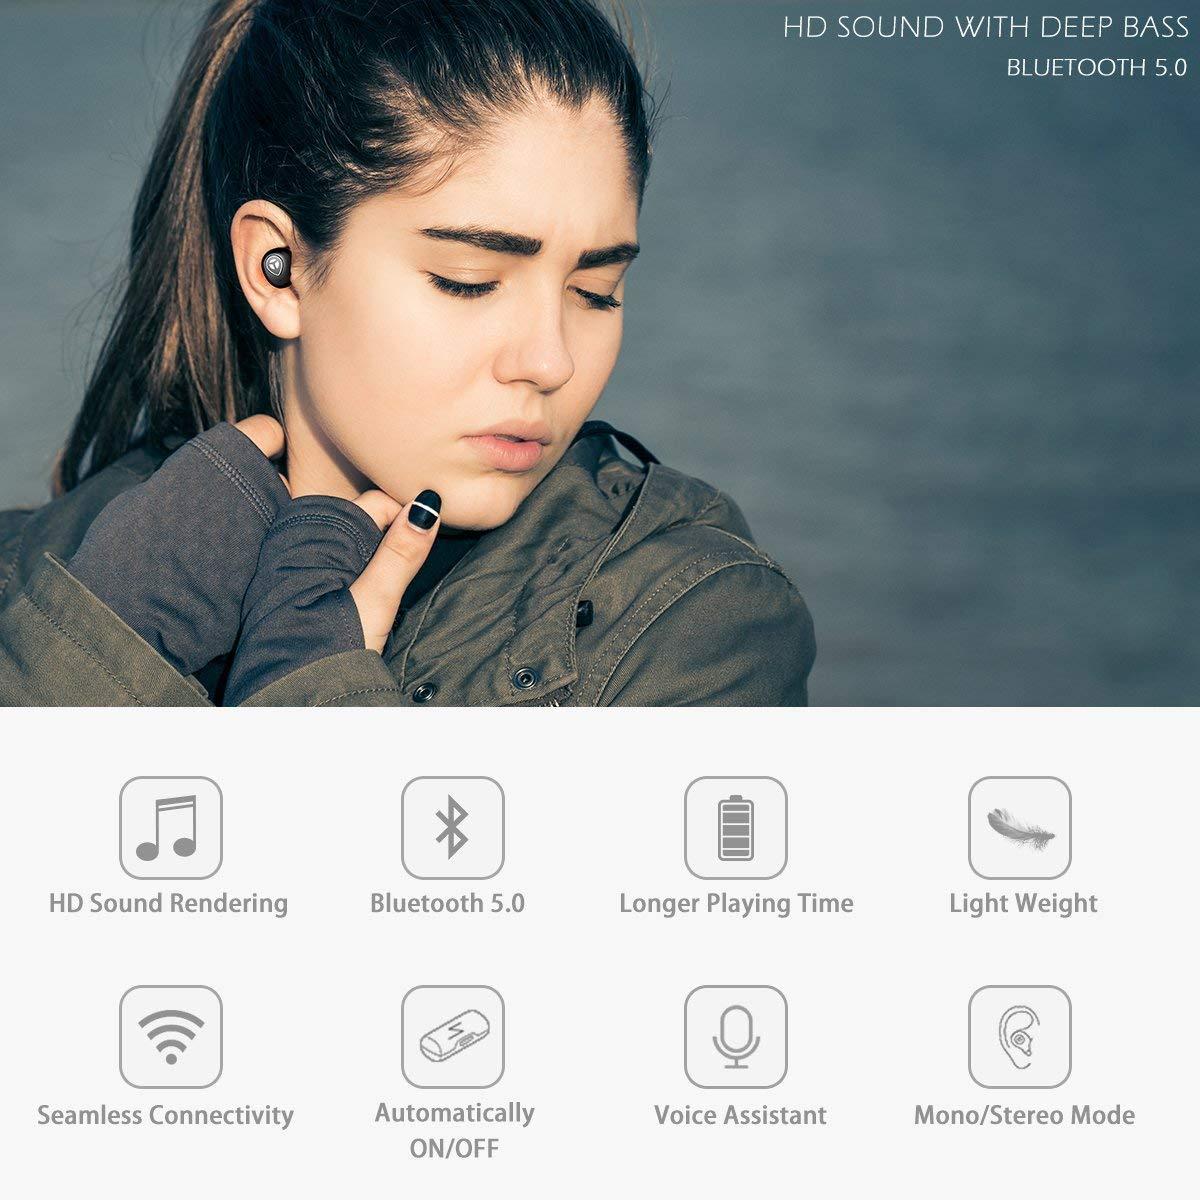 57048551cc7 Amazon.com: Bluetooth 5.0 Deep Bass True Wireless Headphones, Junwer Sports  Wireless Earbuds, Sweat Proof Earphones Built-in Microphone for Running, ...